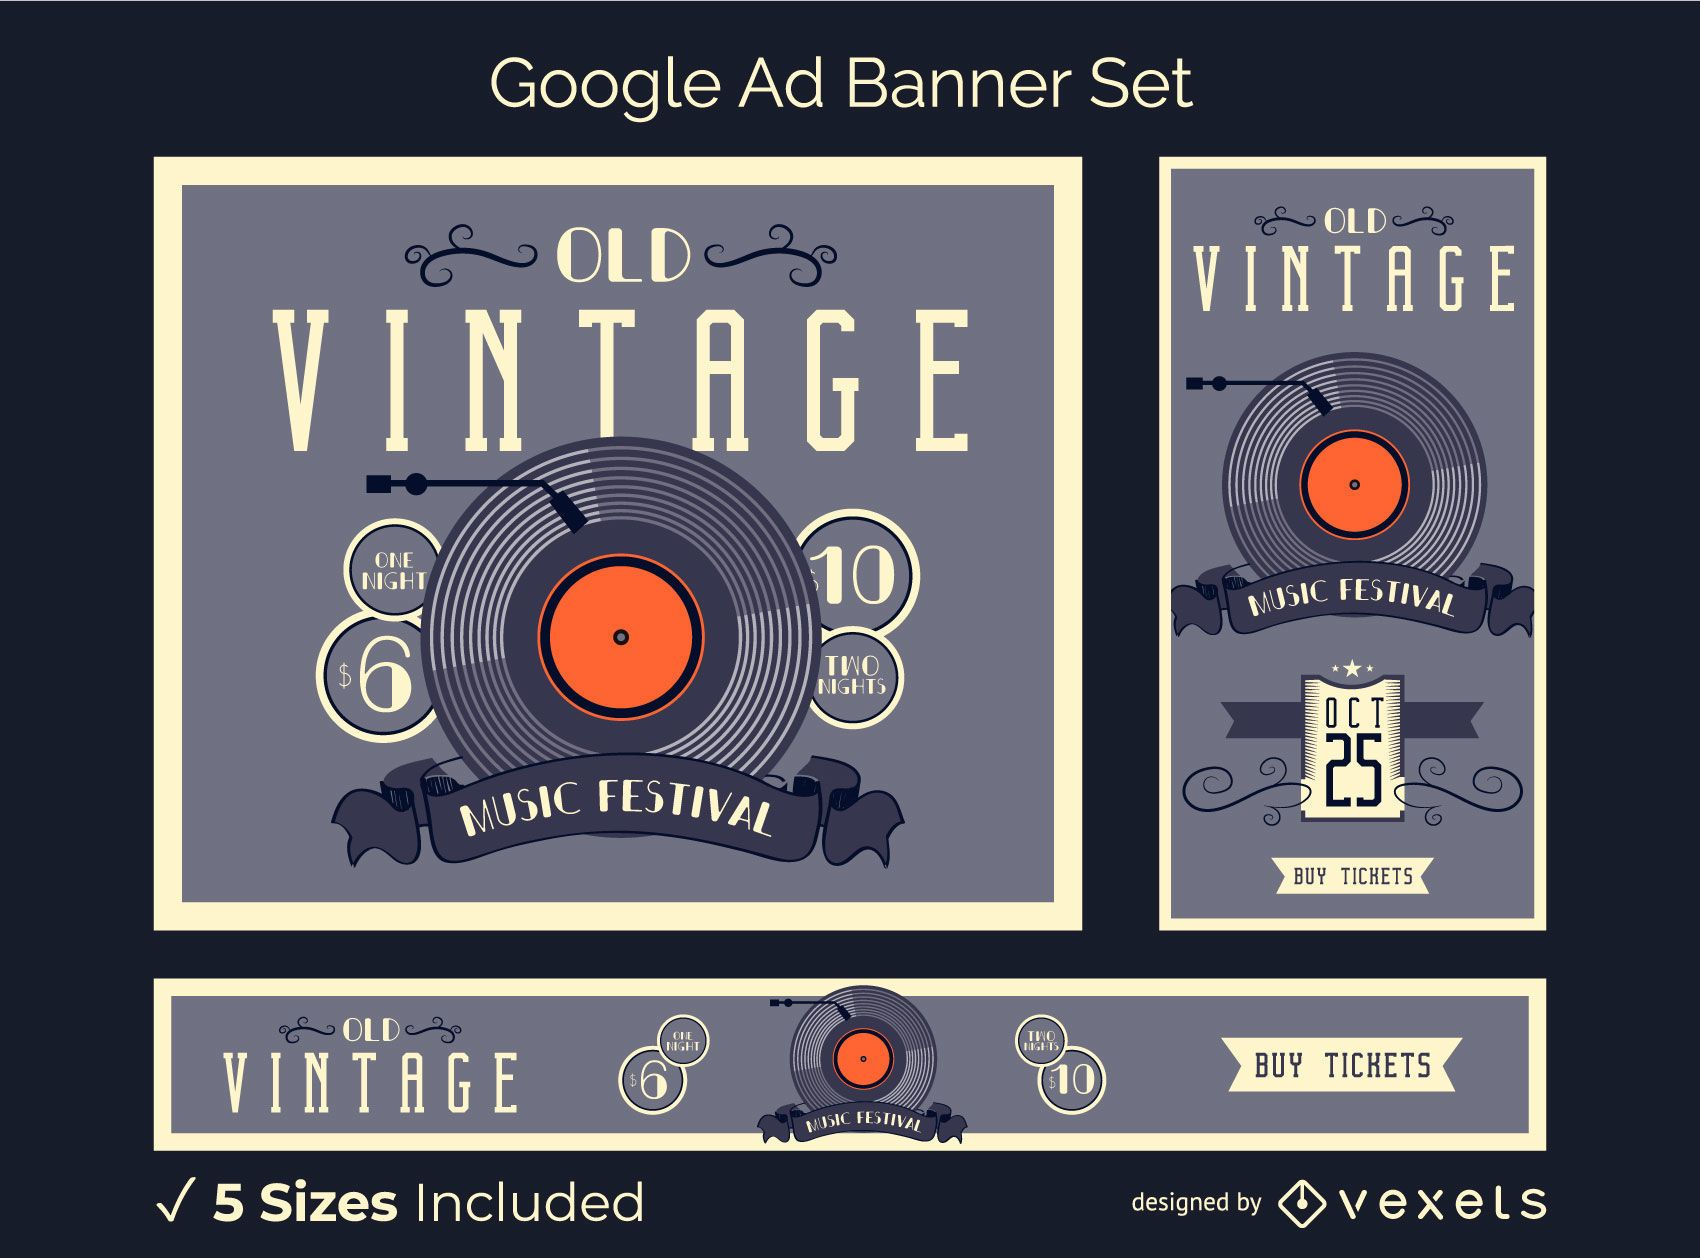 Vintage vinyl ad banner set